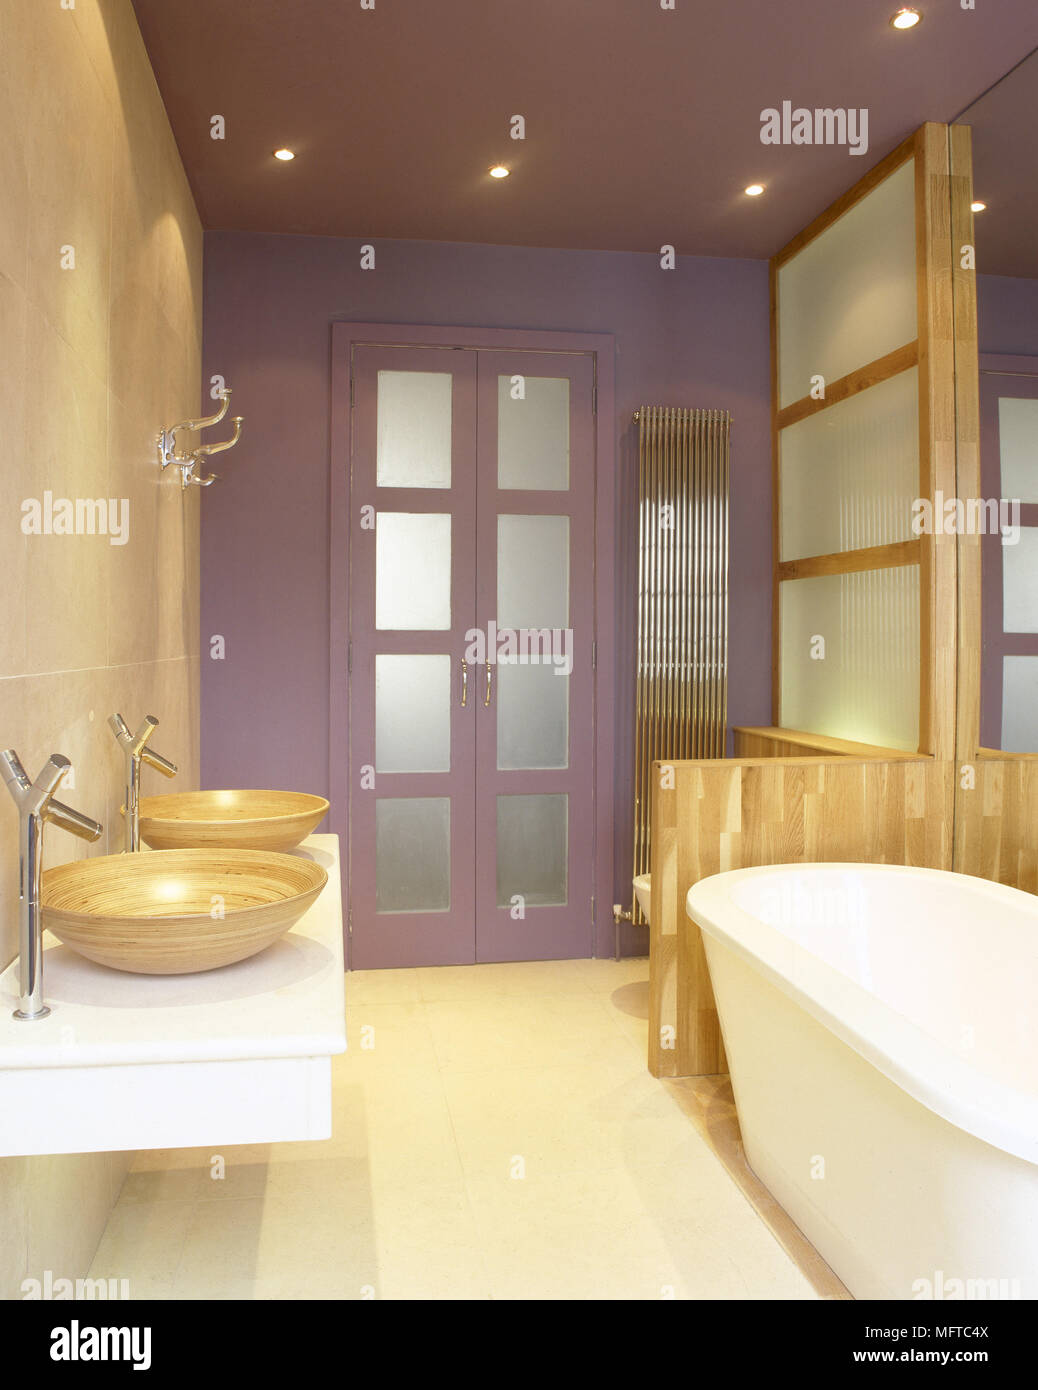 Modern Tiled Bathroom With Wooden Sinks On A Floating Shelf